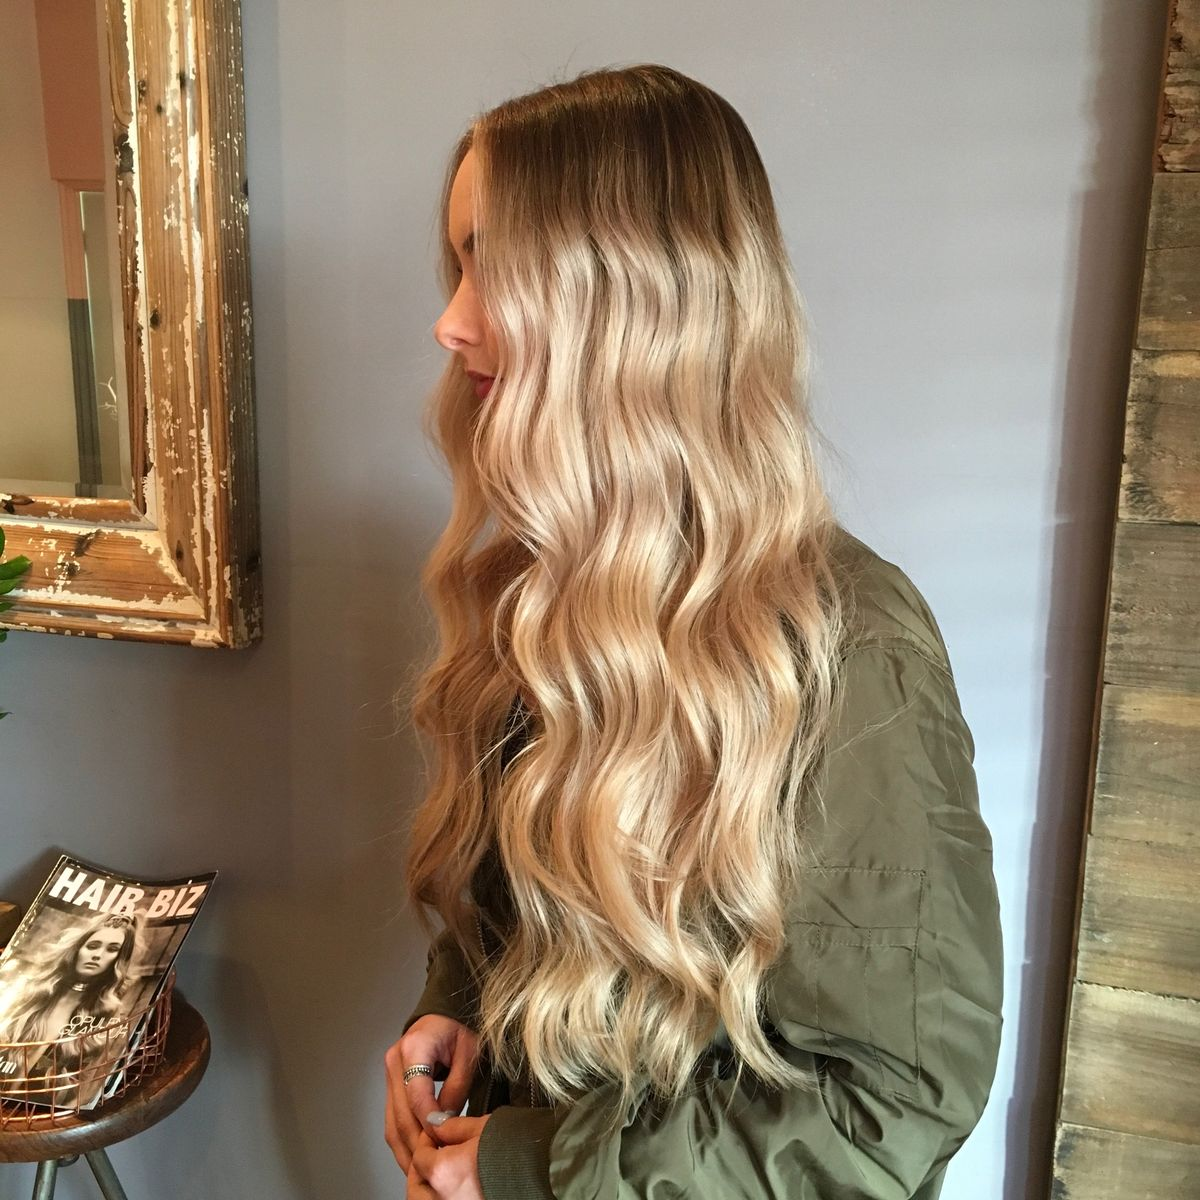 Belayage creamy bright hair contouring waves long hair